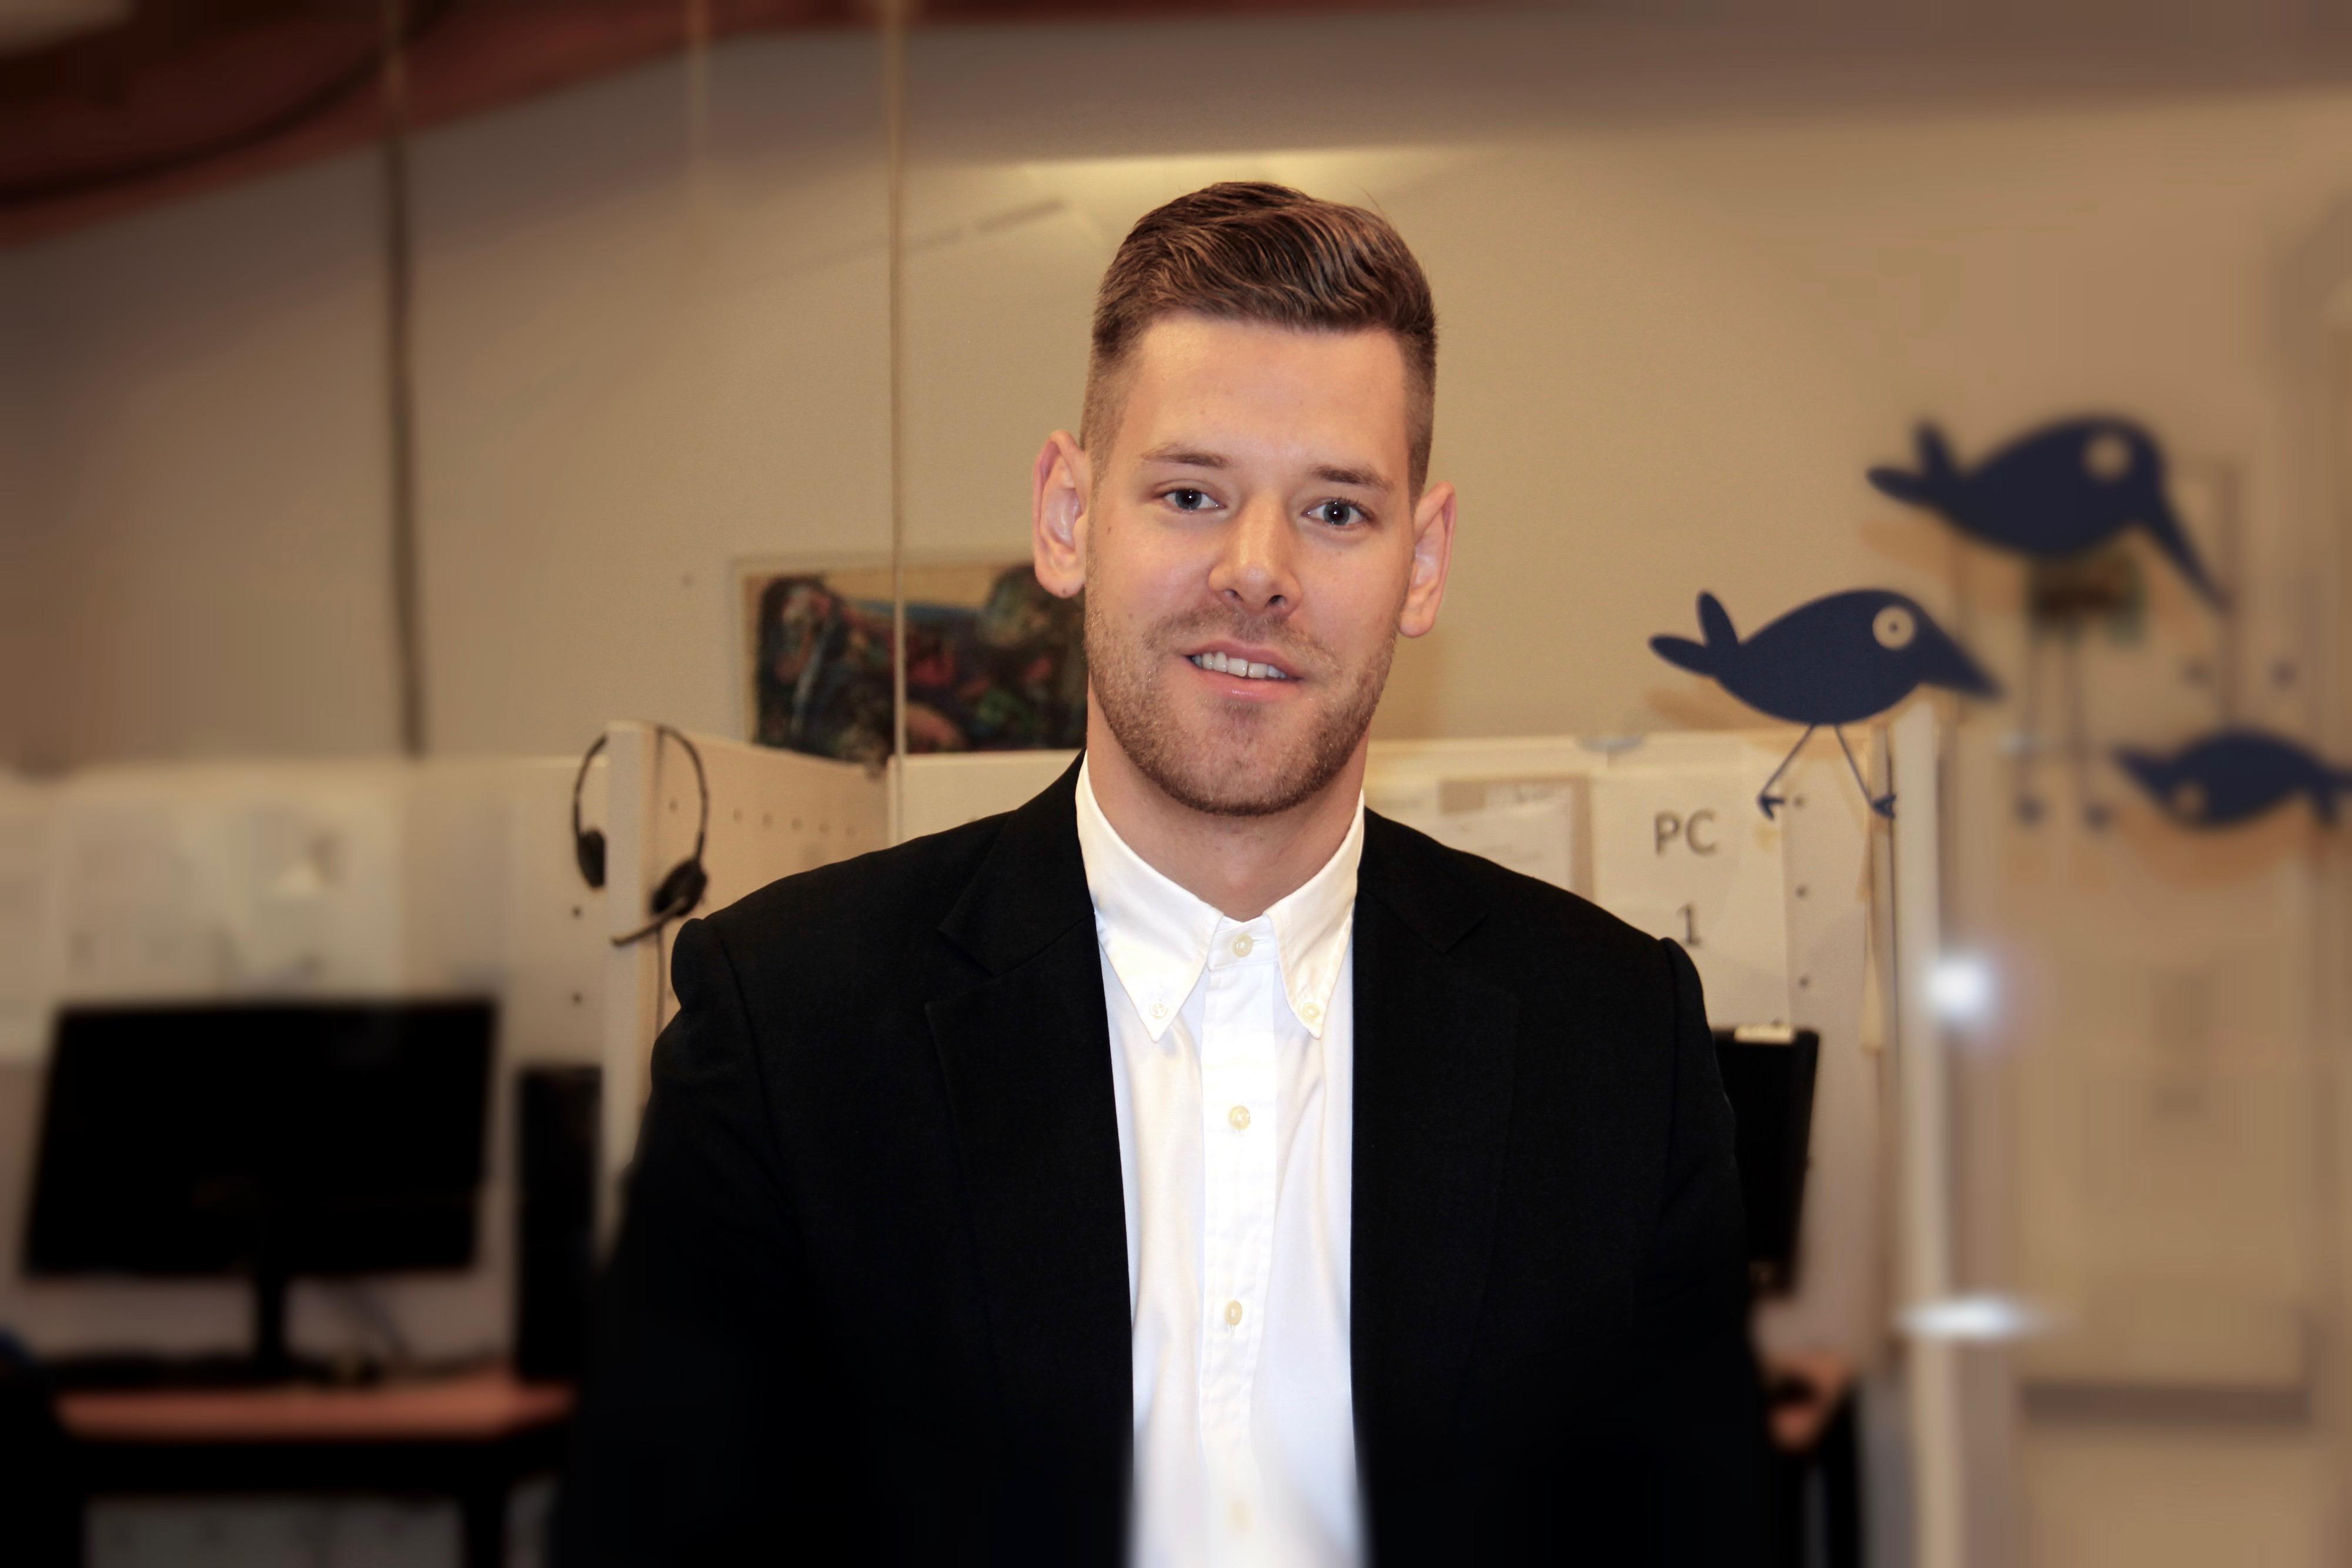 Mikkel Dissing Bøgh Pedersen